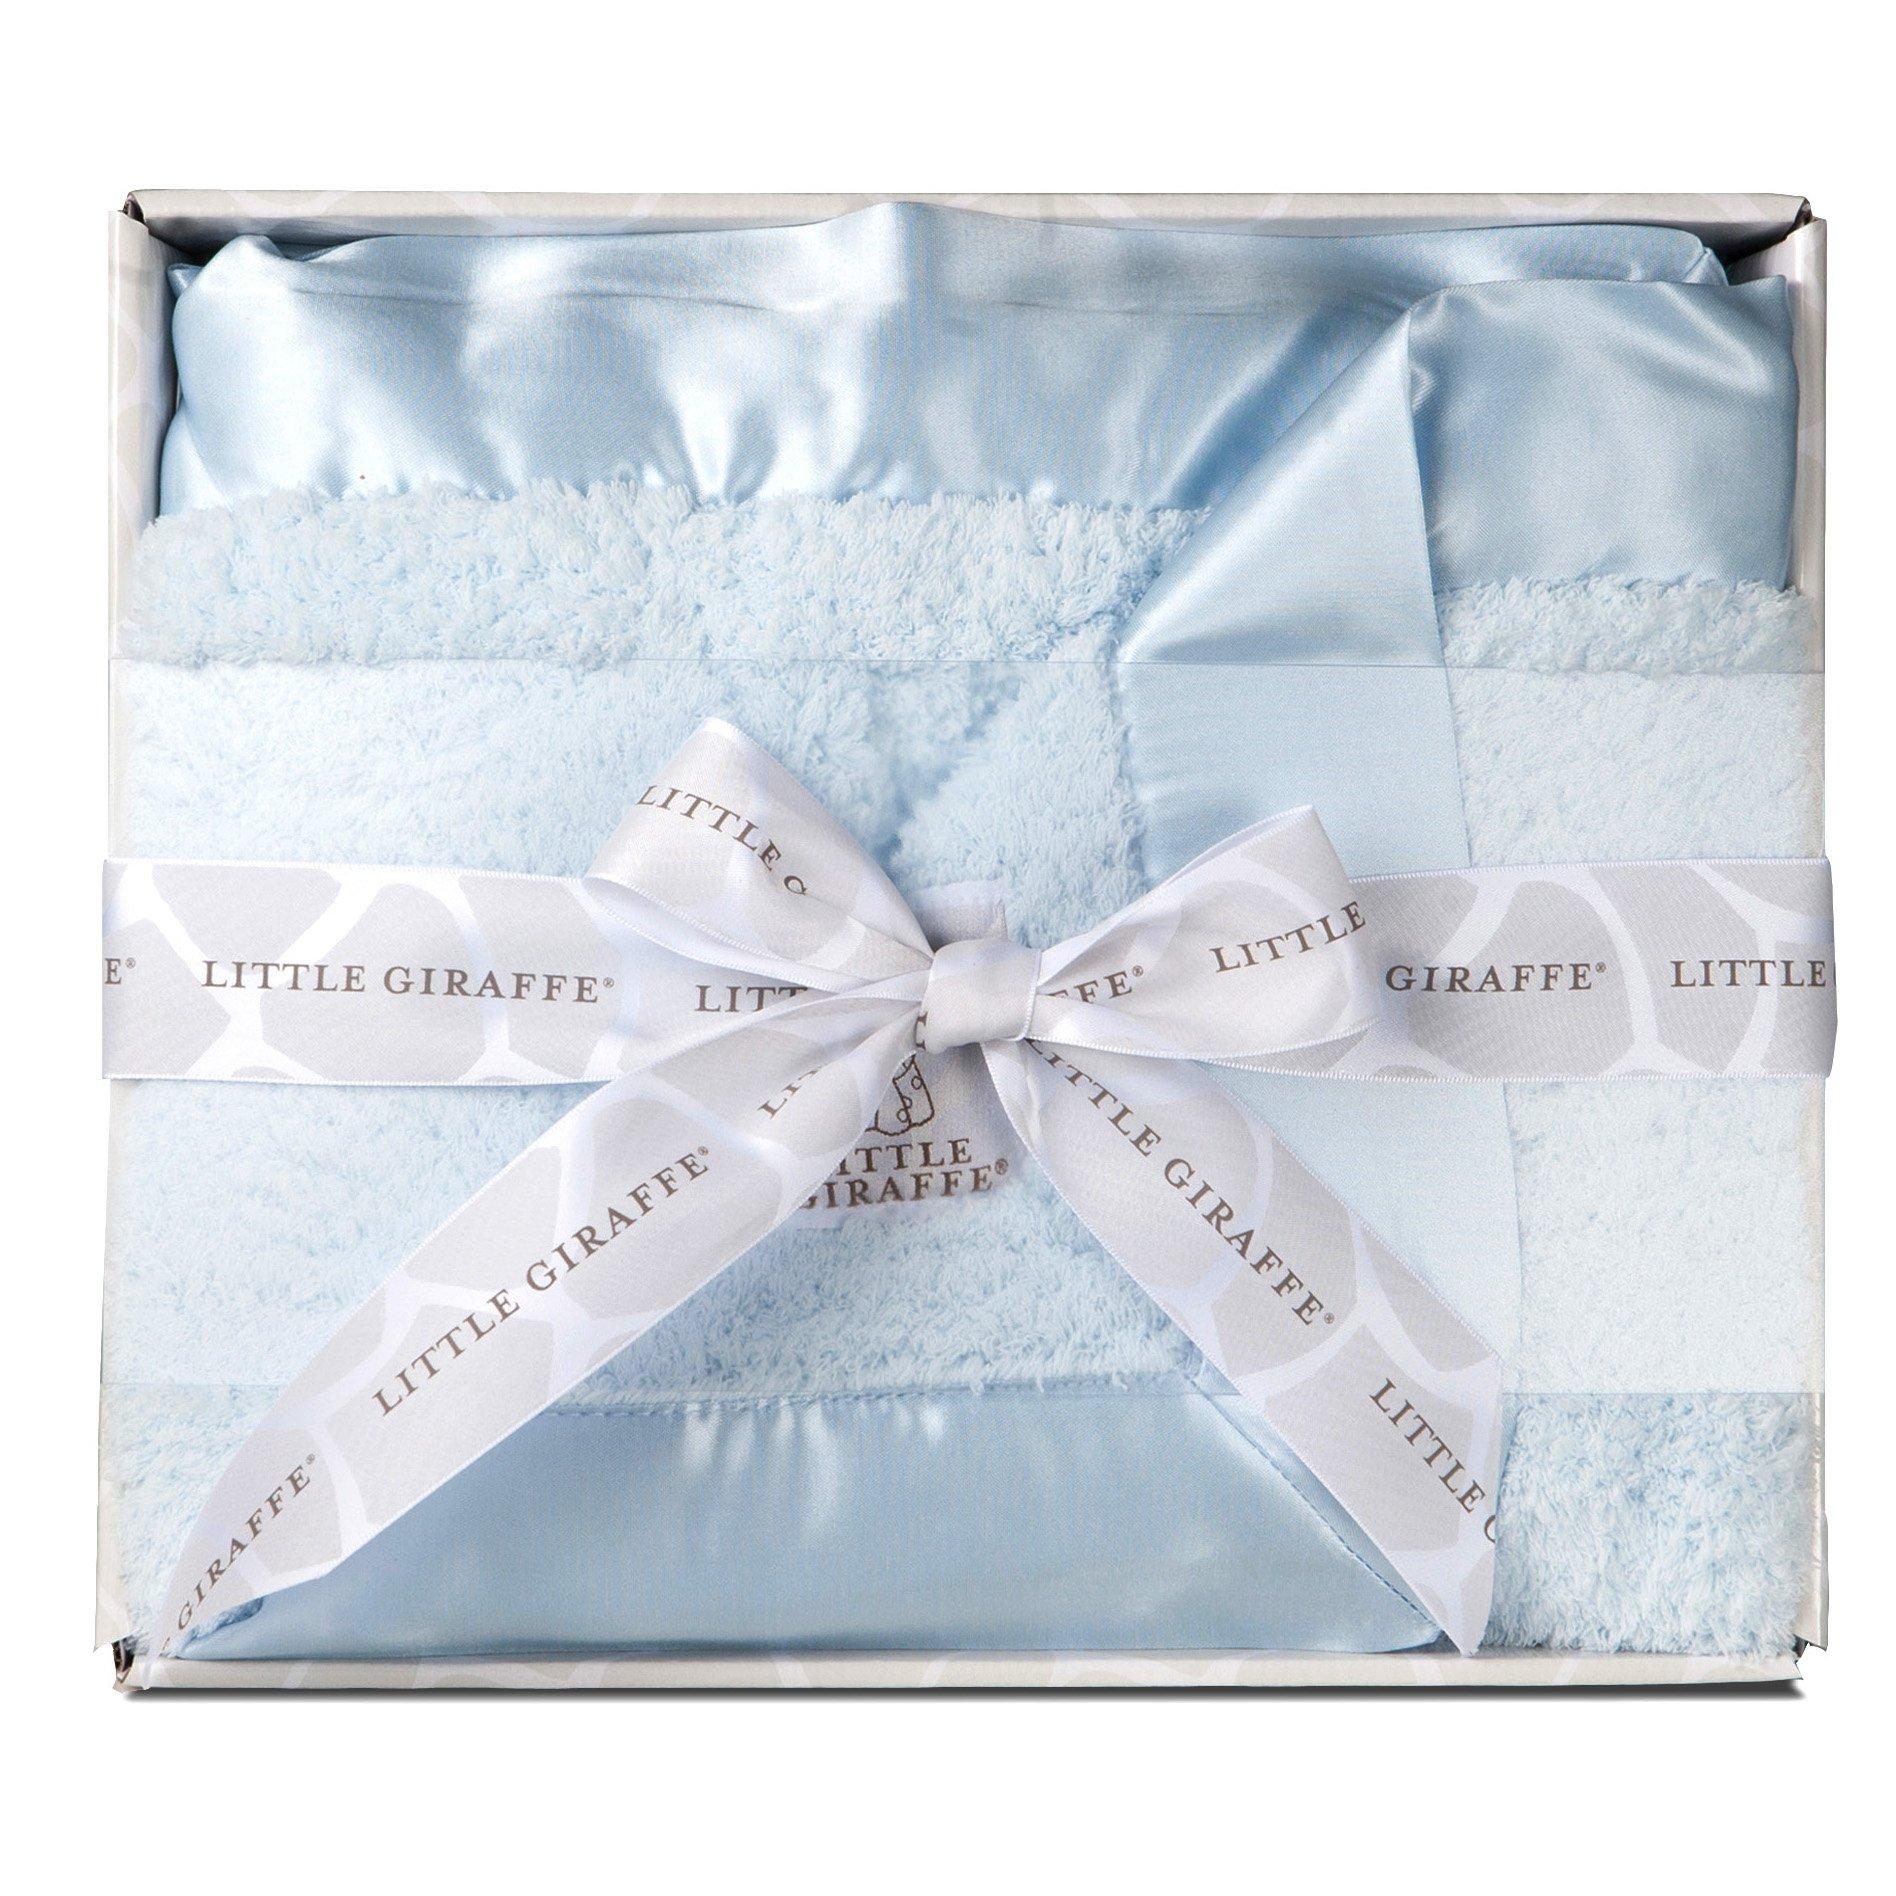 Ritorujirafu Little Giraffe - Dealer imports] chenille baby blanket (Blue) / BOX containing lg0001-01B